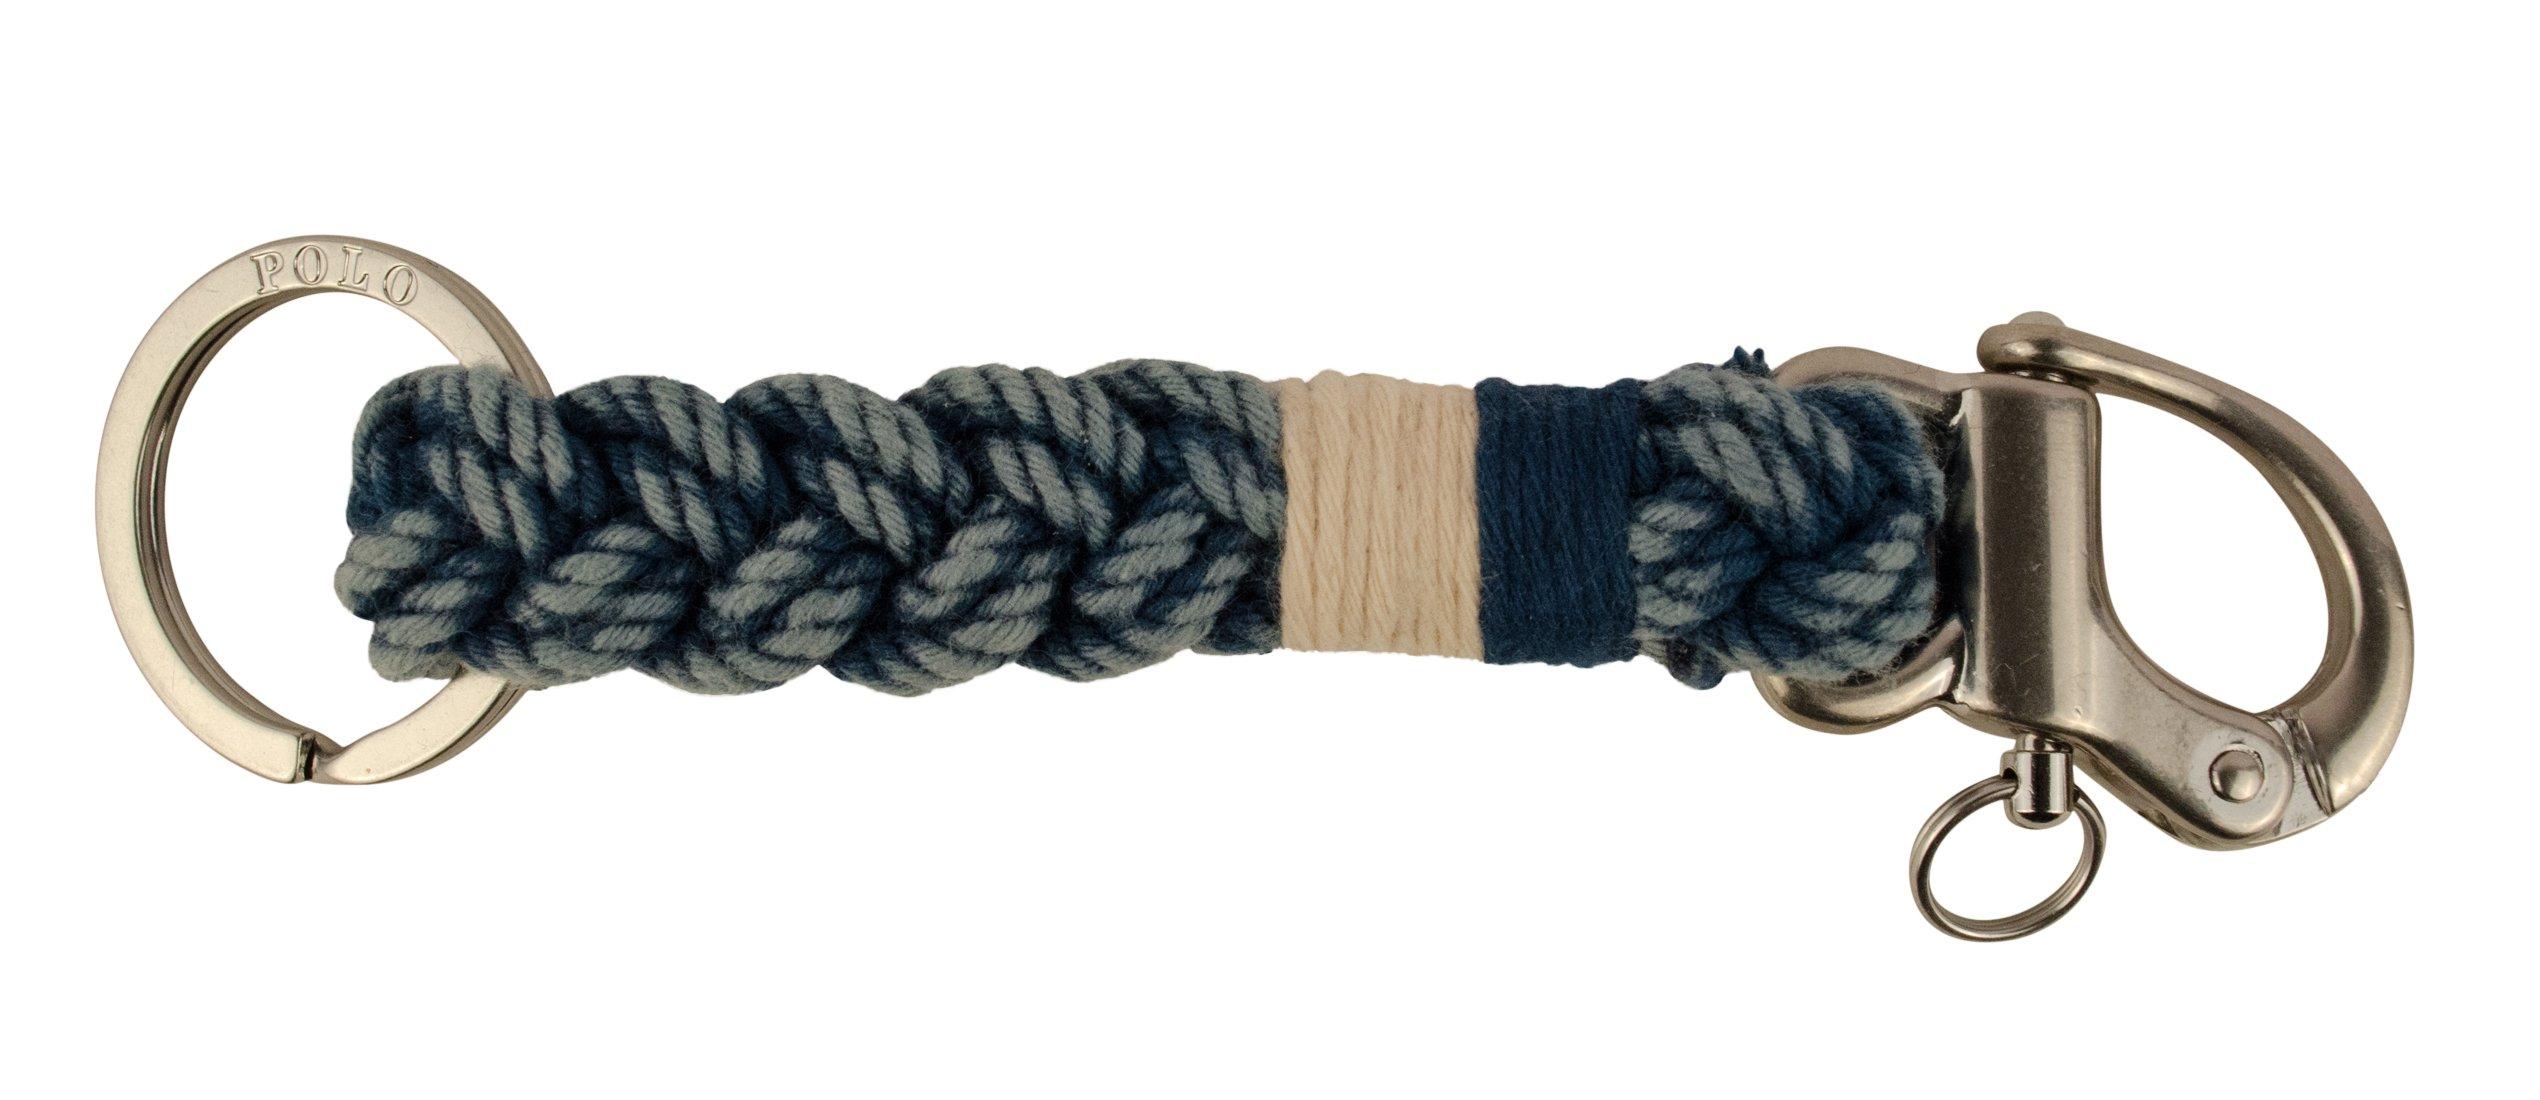 Polo Ralph Lauren Snap-Shackle Braided Key Fob Key Chain-I-OS